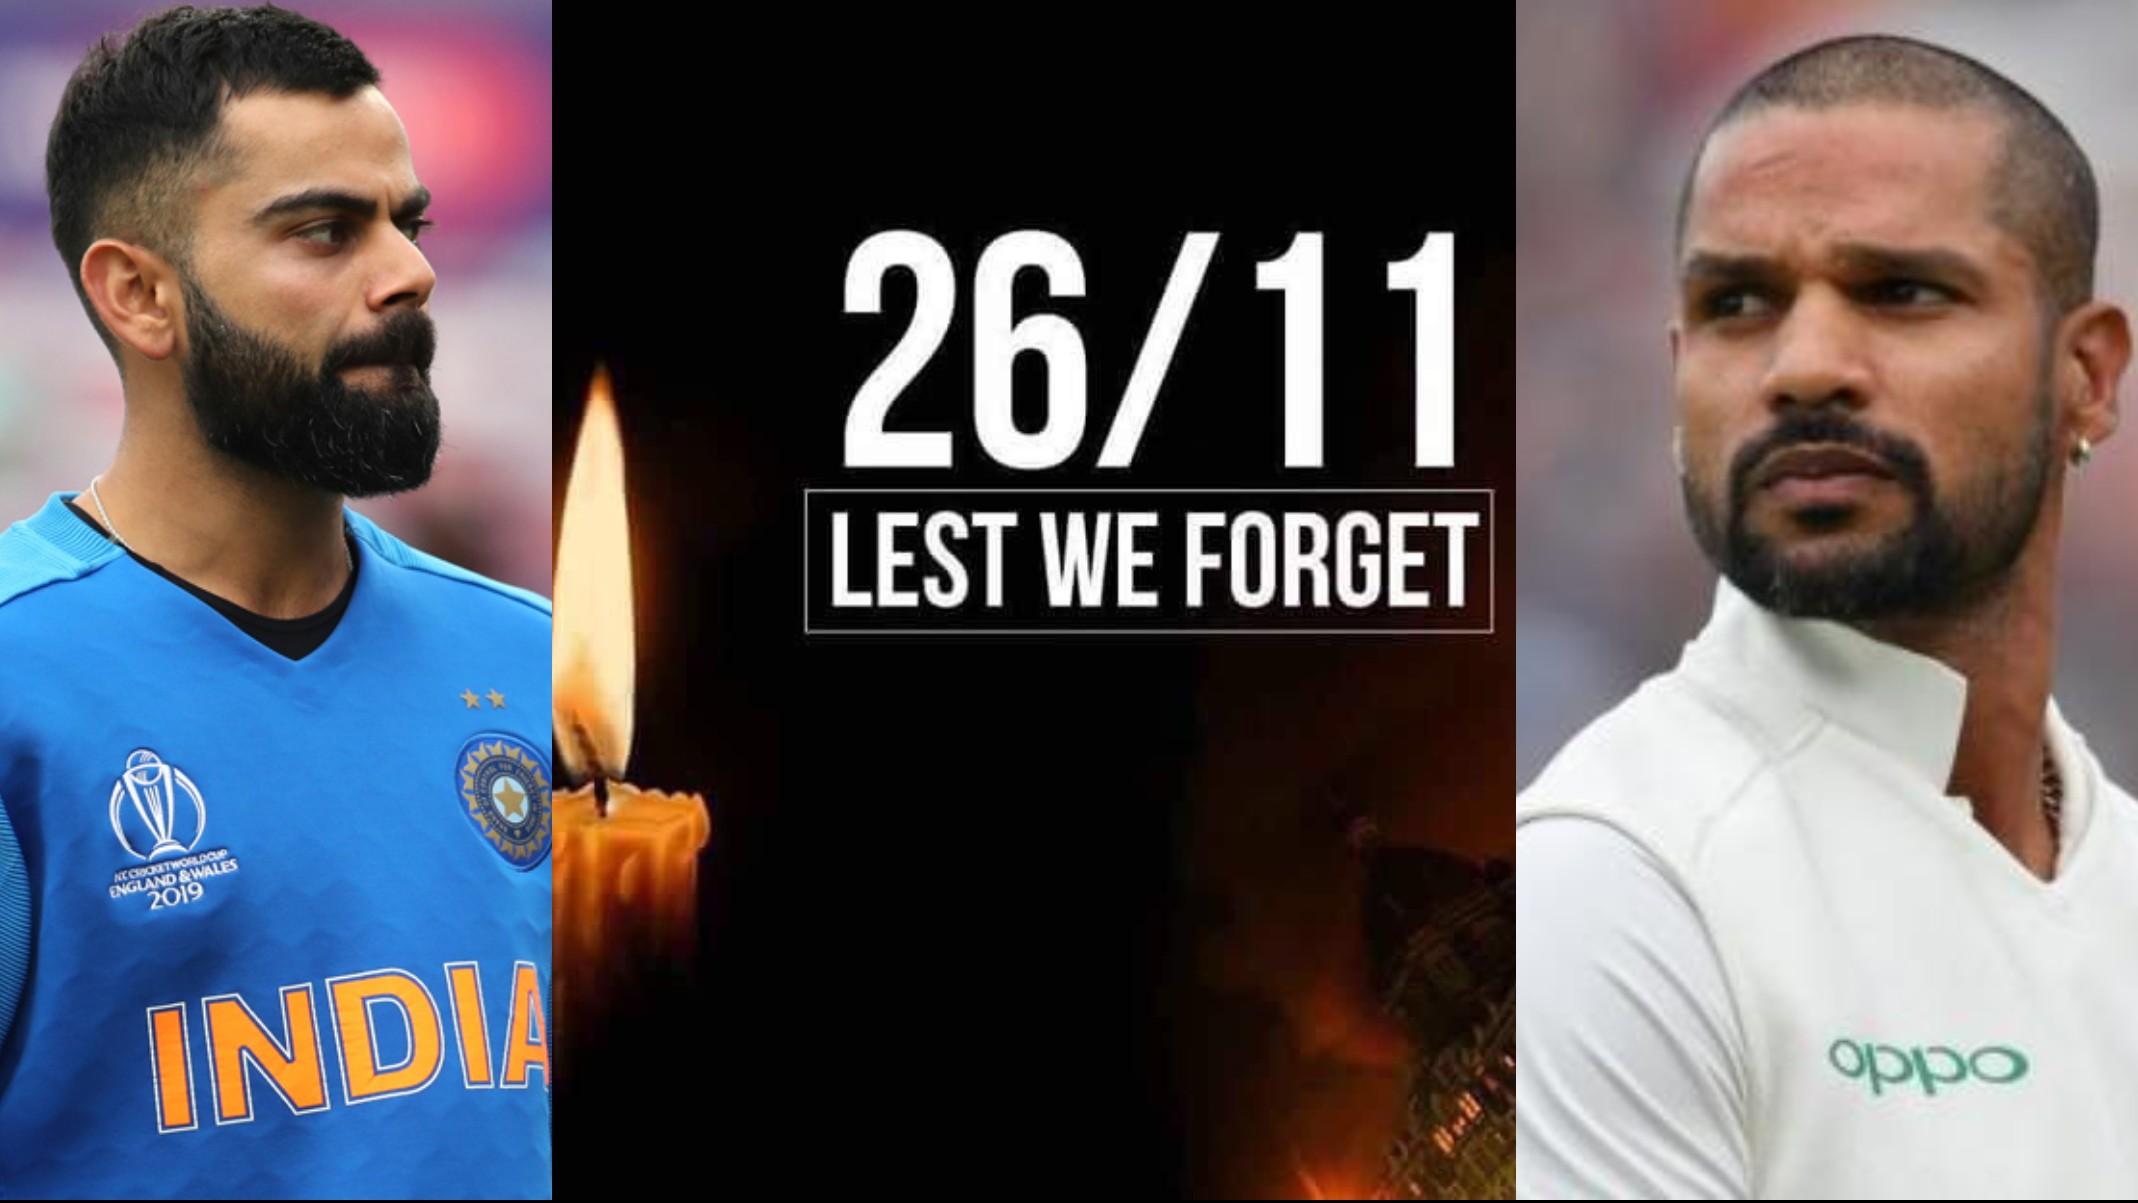 Team India members pay tribute to victims of 2008 Mumbai Terrorist attacks